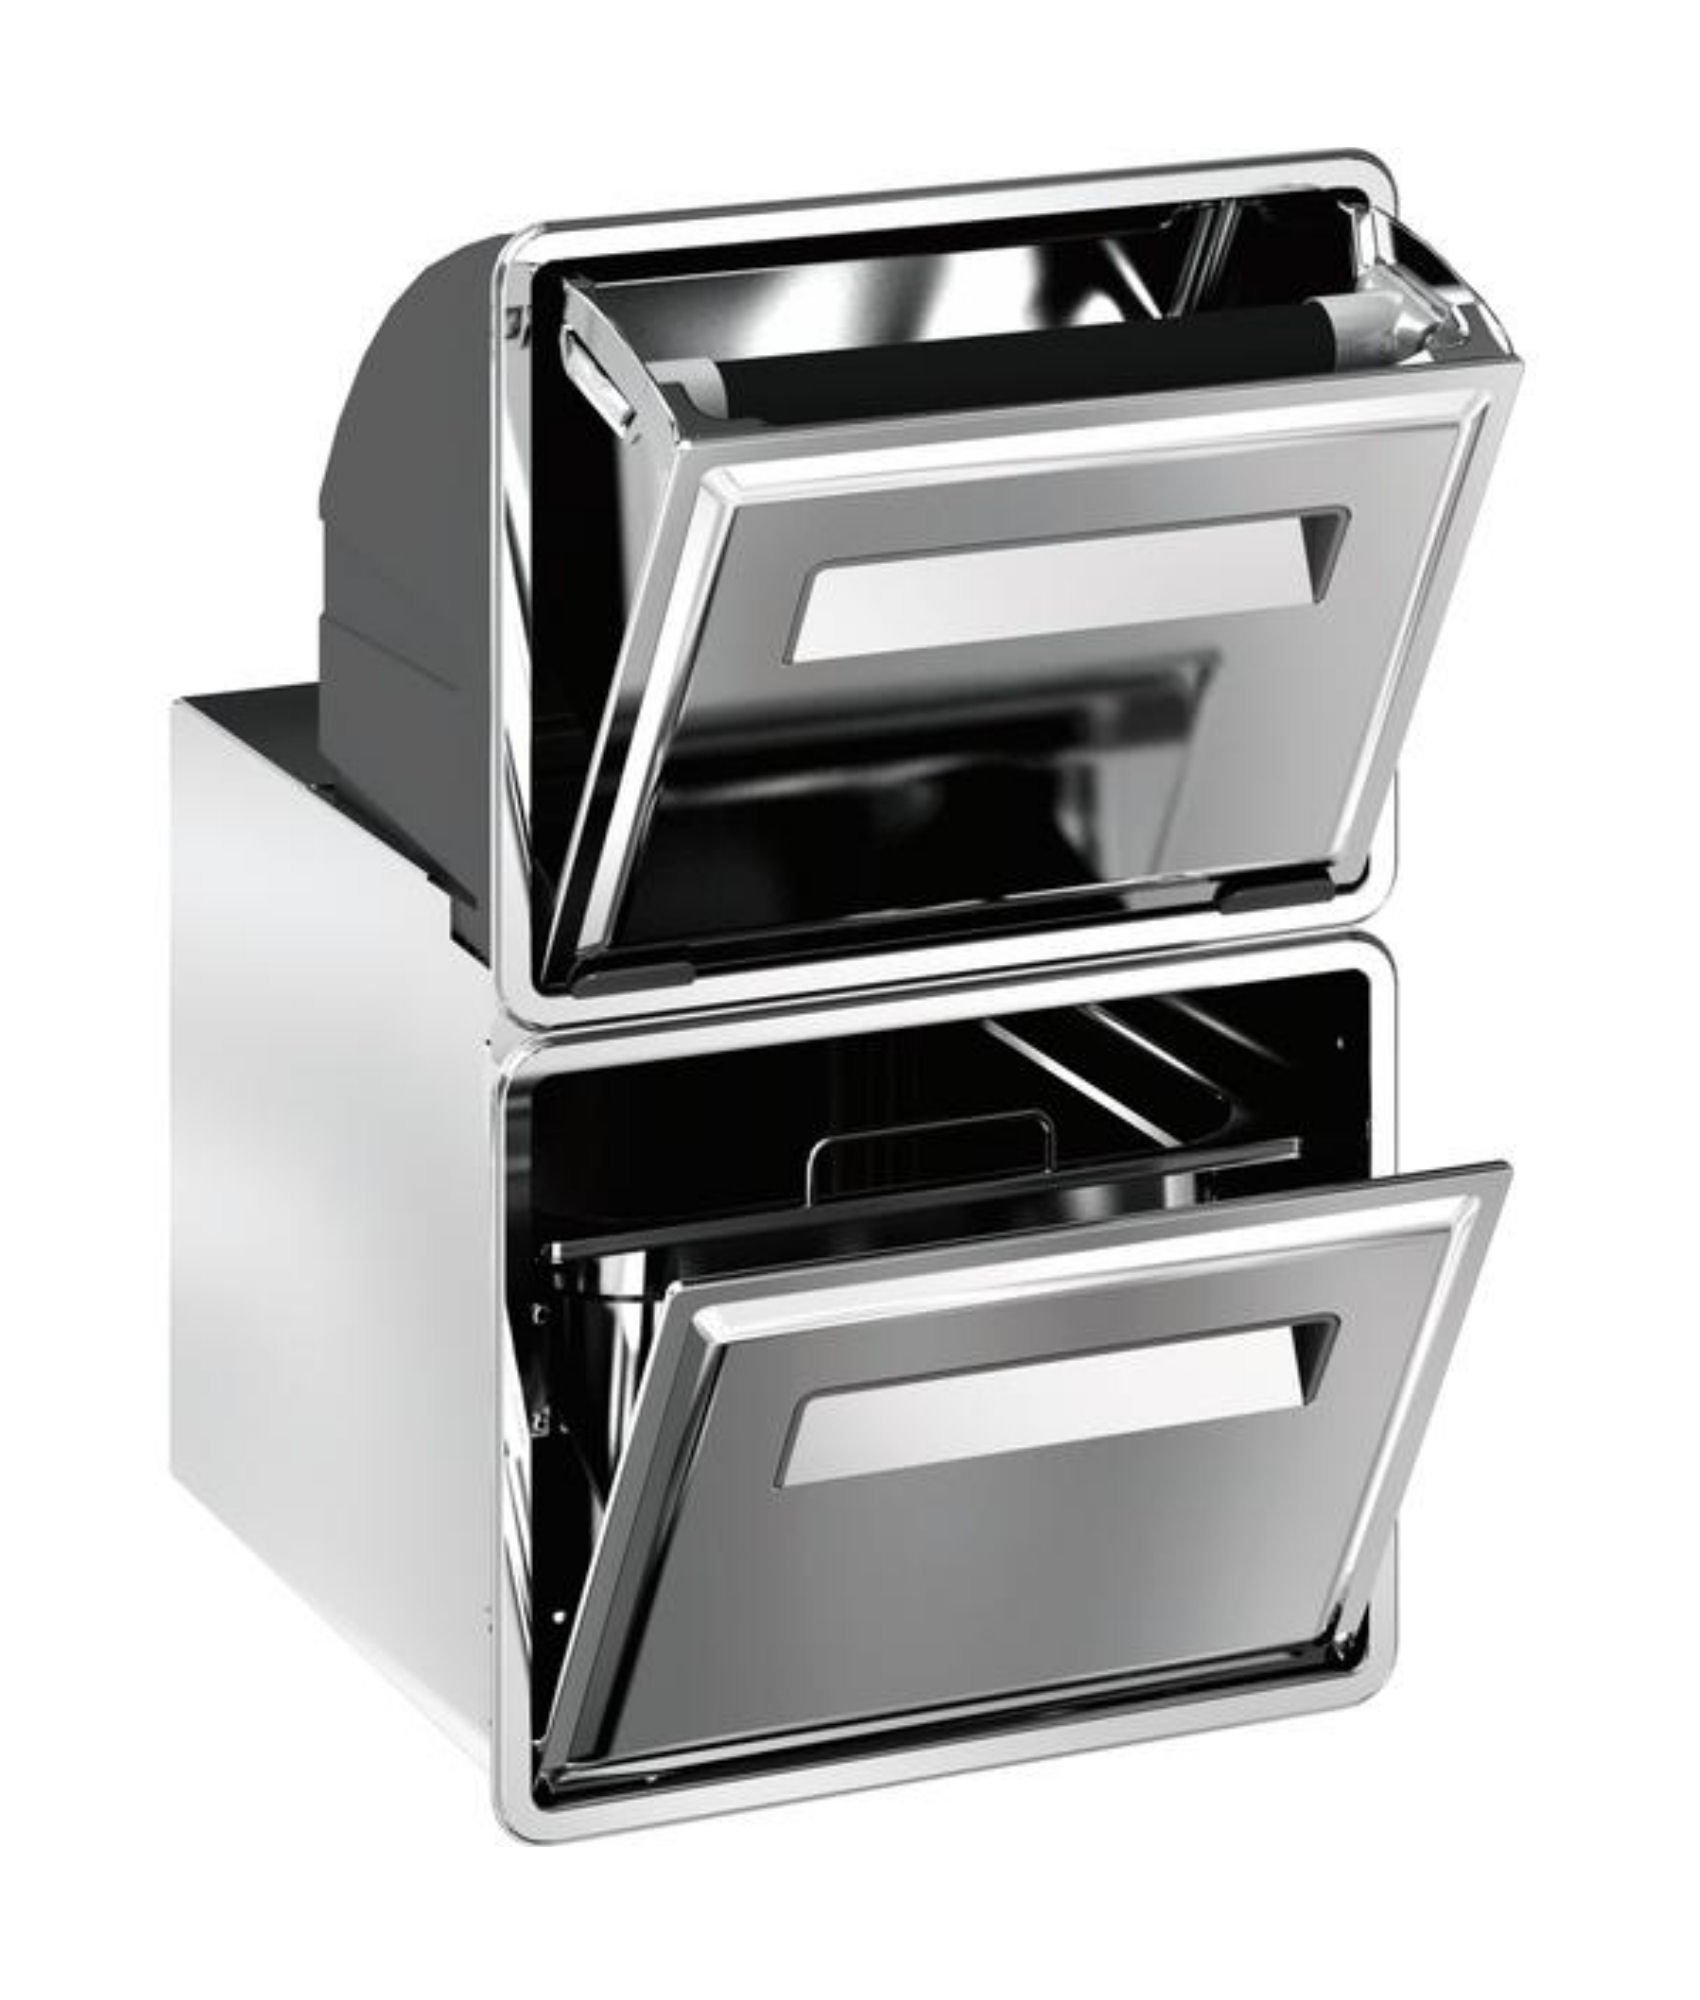 ronda doppelbeh lter f r kaffeesatz ag14. Black Bedroom Furniture Sets. Home Design Ideas